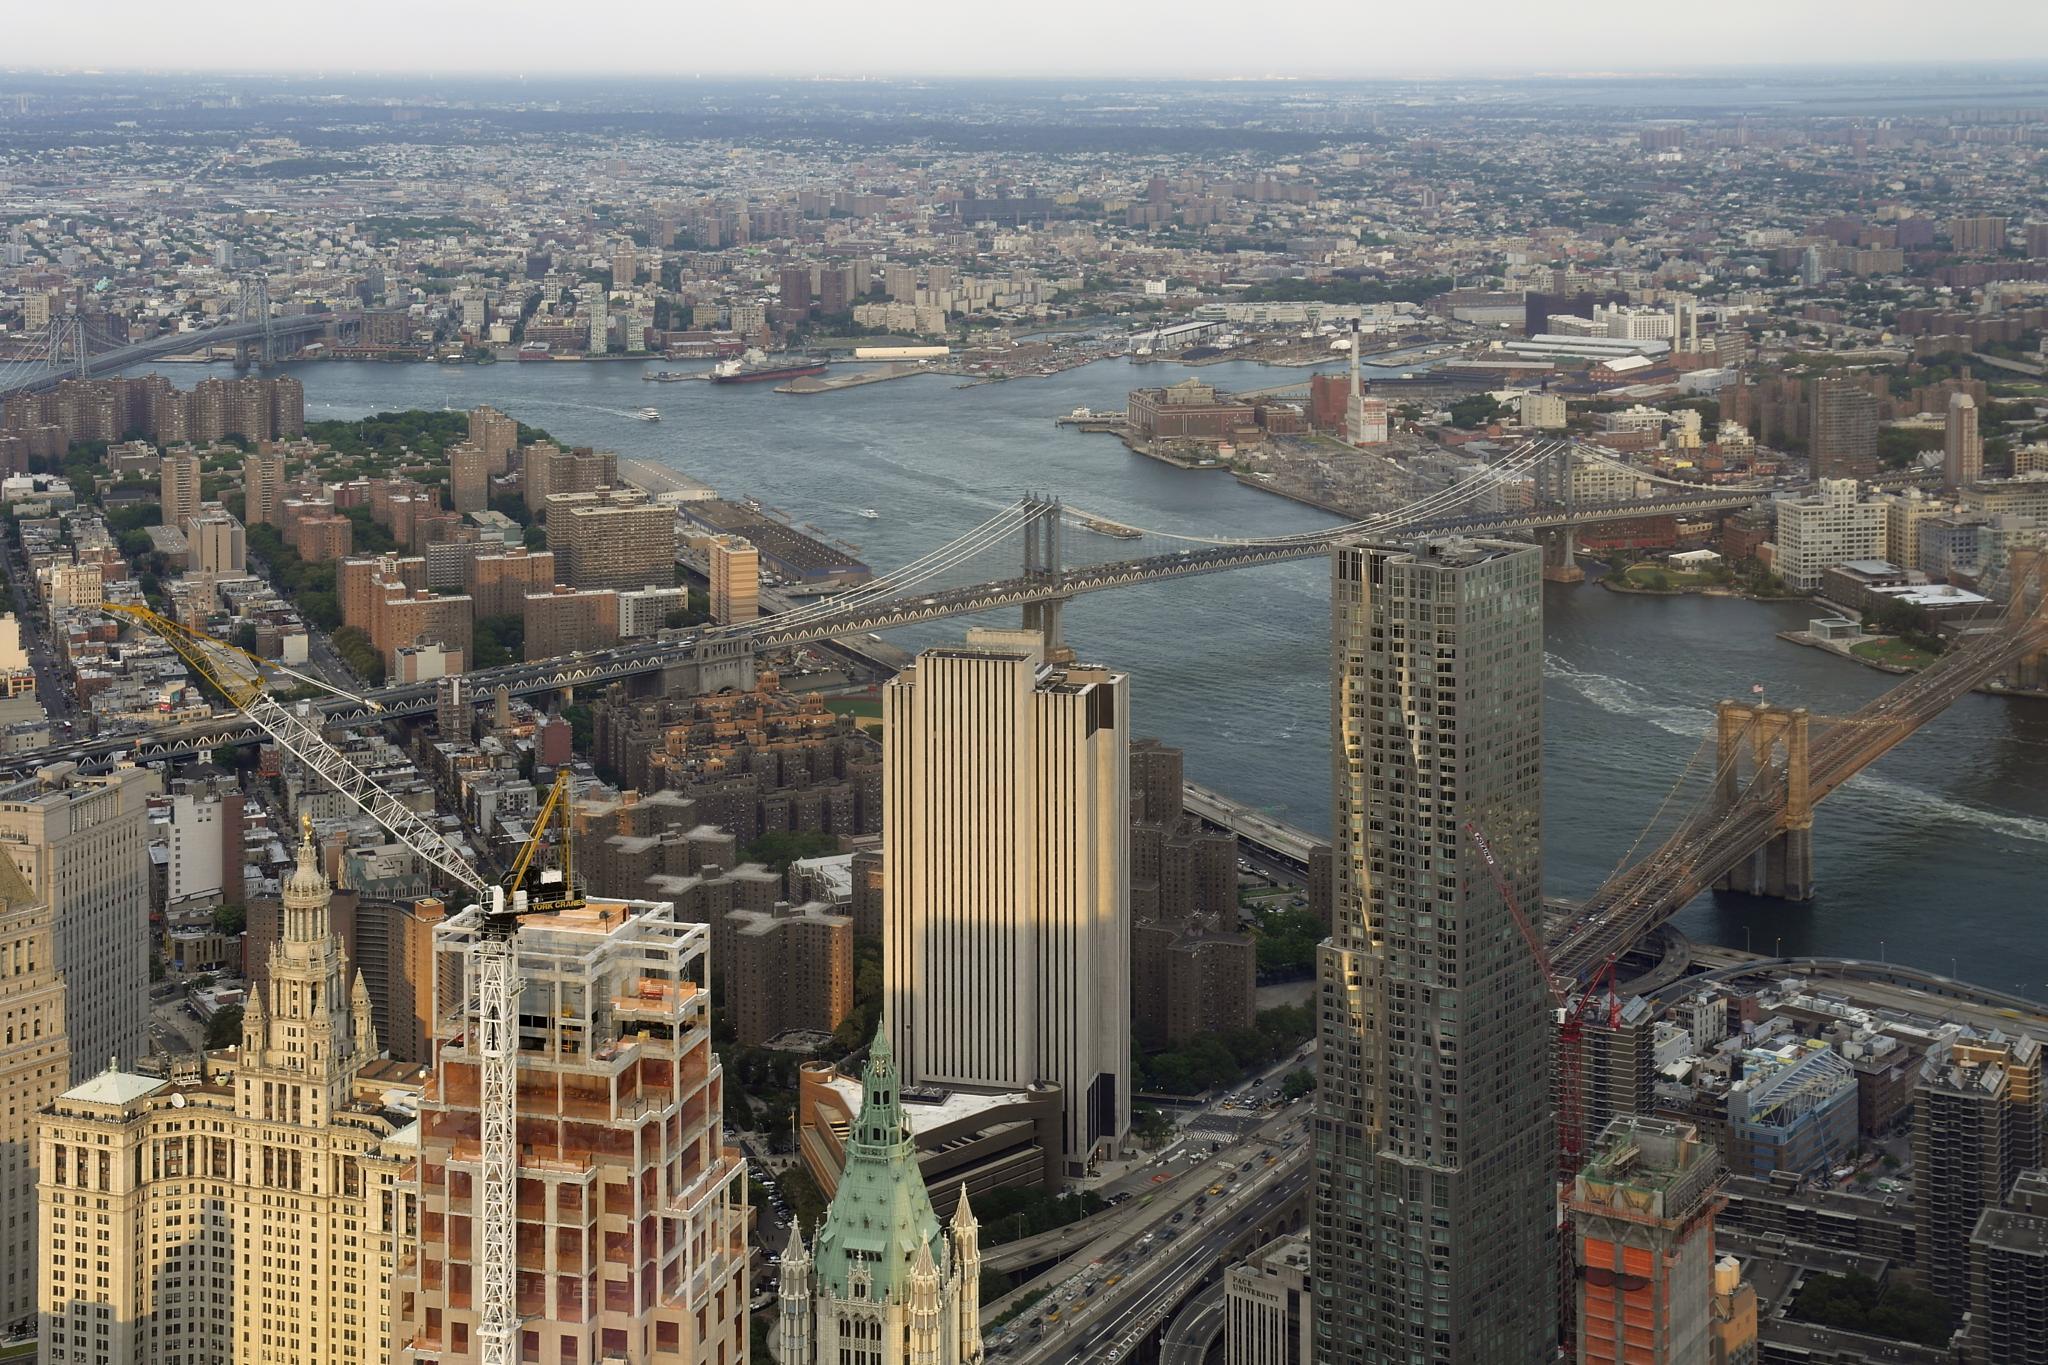 New York New York by visbimmer79